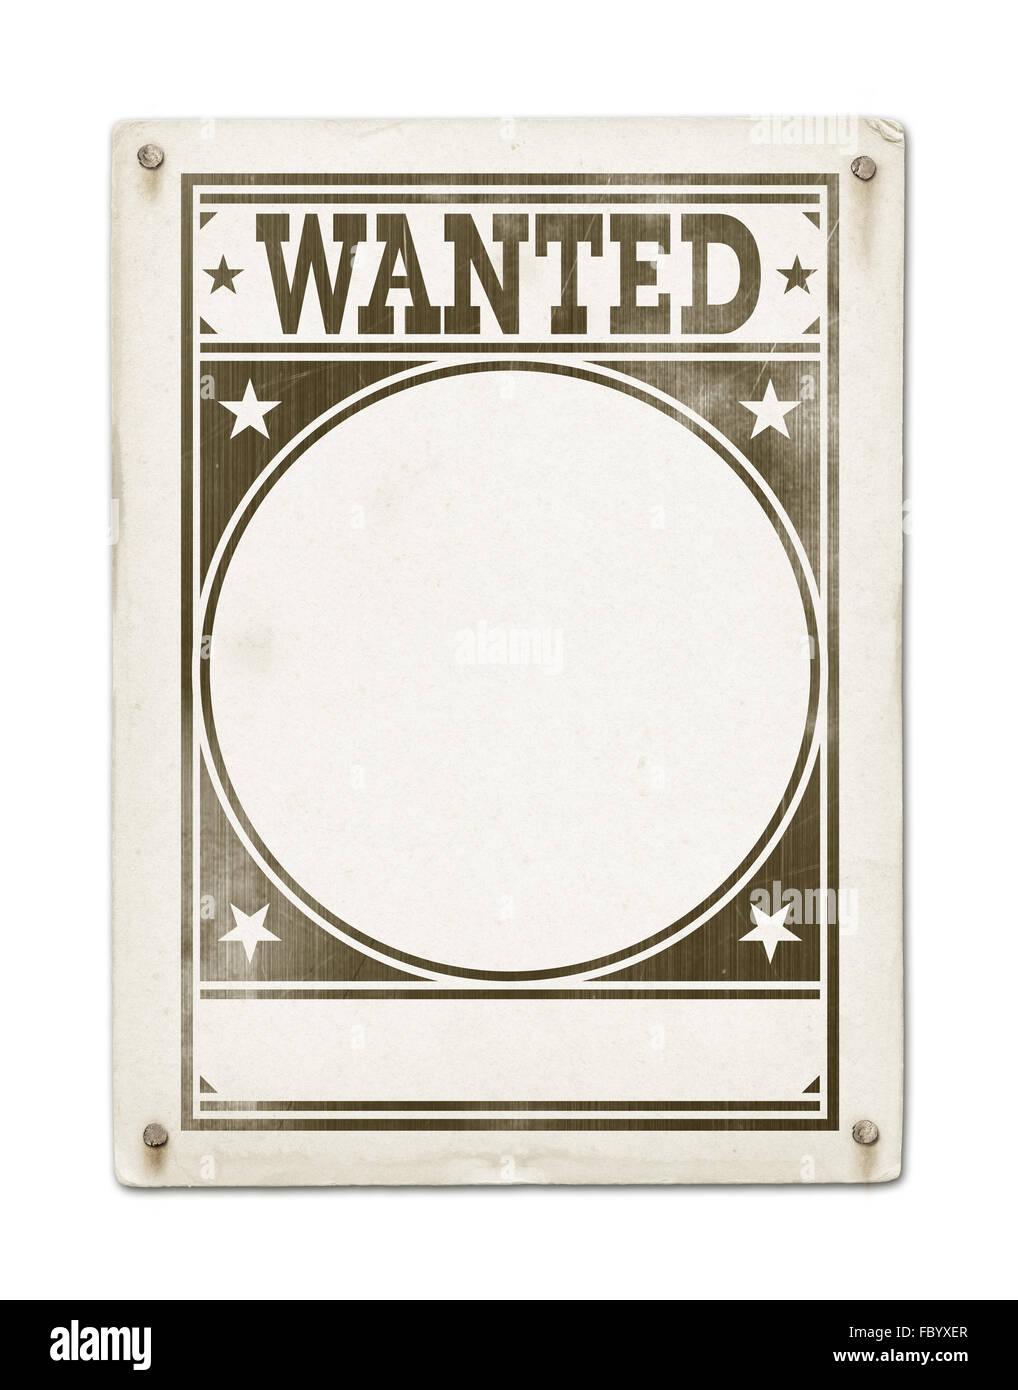 Wanted Poster Template | Wanted Poster Template Stock Photos Wanted Poster Template Stock